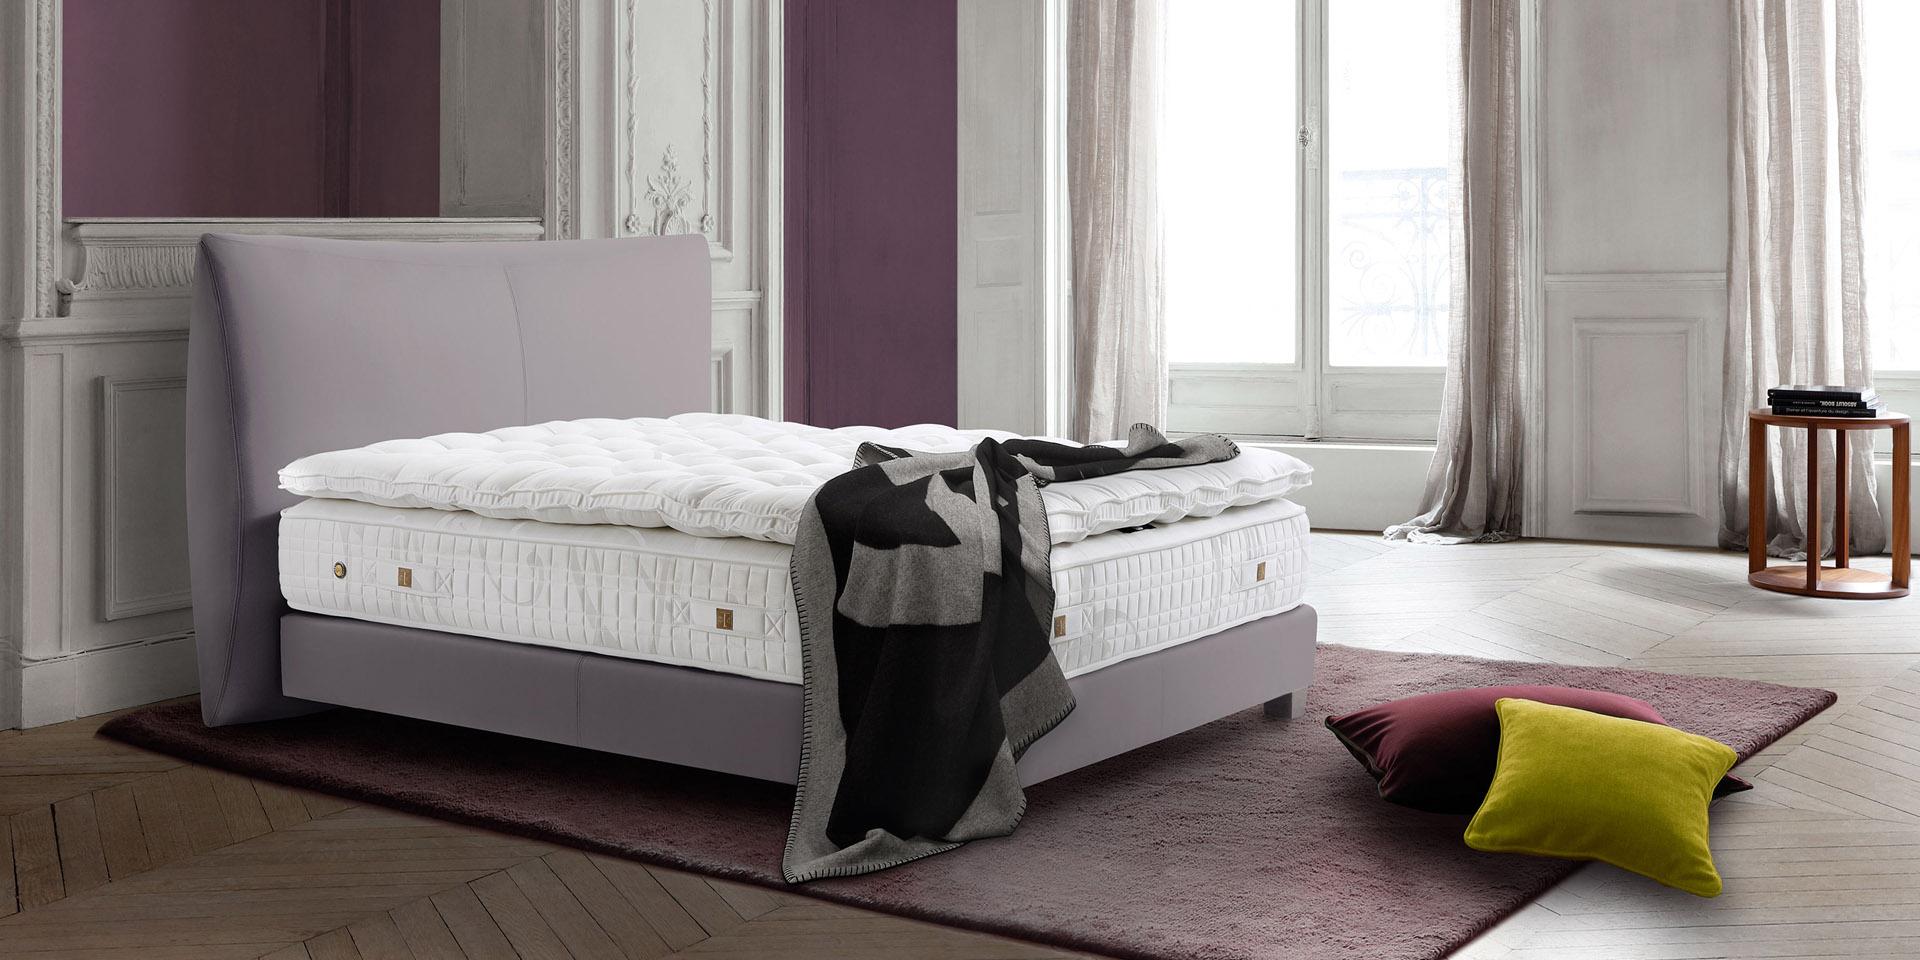 header marke treca interiors paris 2 fenchel wohnfaszination gmbh. Black Bedroom Furniture Sets. Home Design Ideas